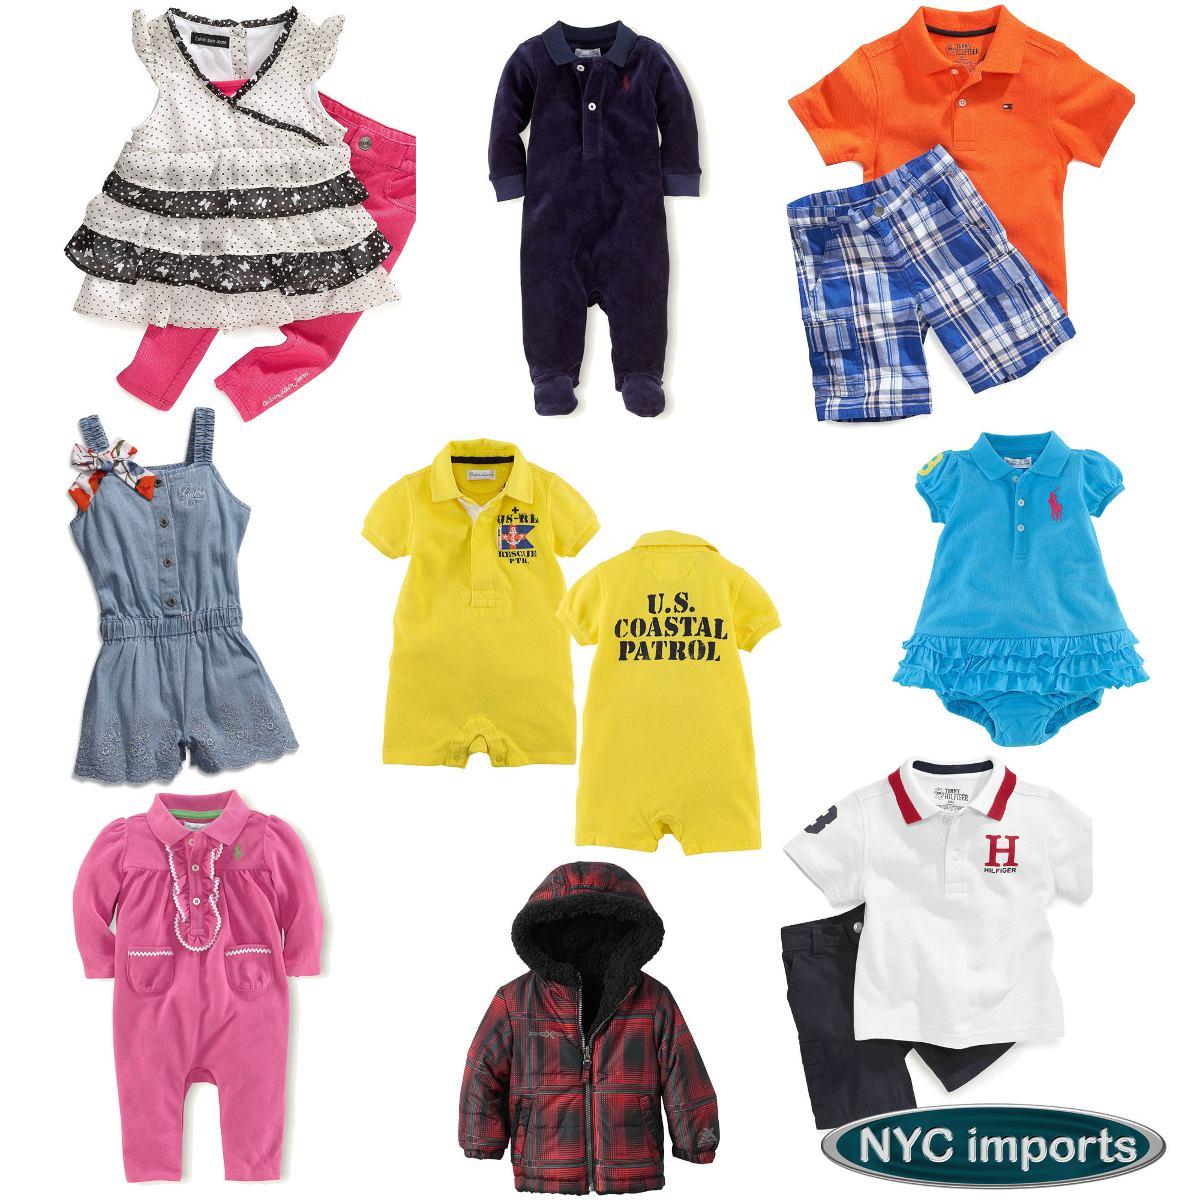 roupas de bebê importadas ck ralph lauren tommy carters. Carregando zoom. 34e733a8d2c